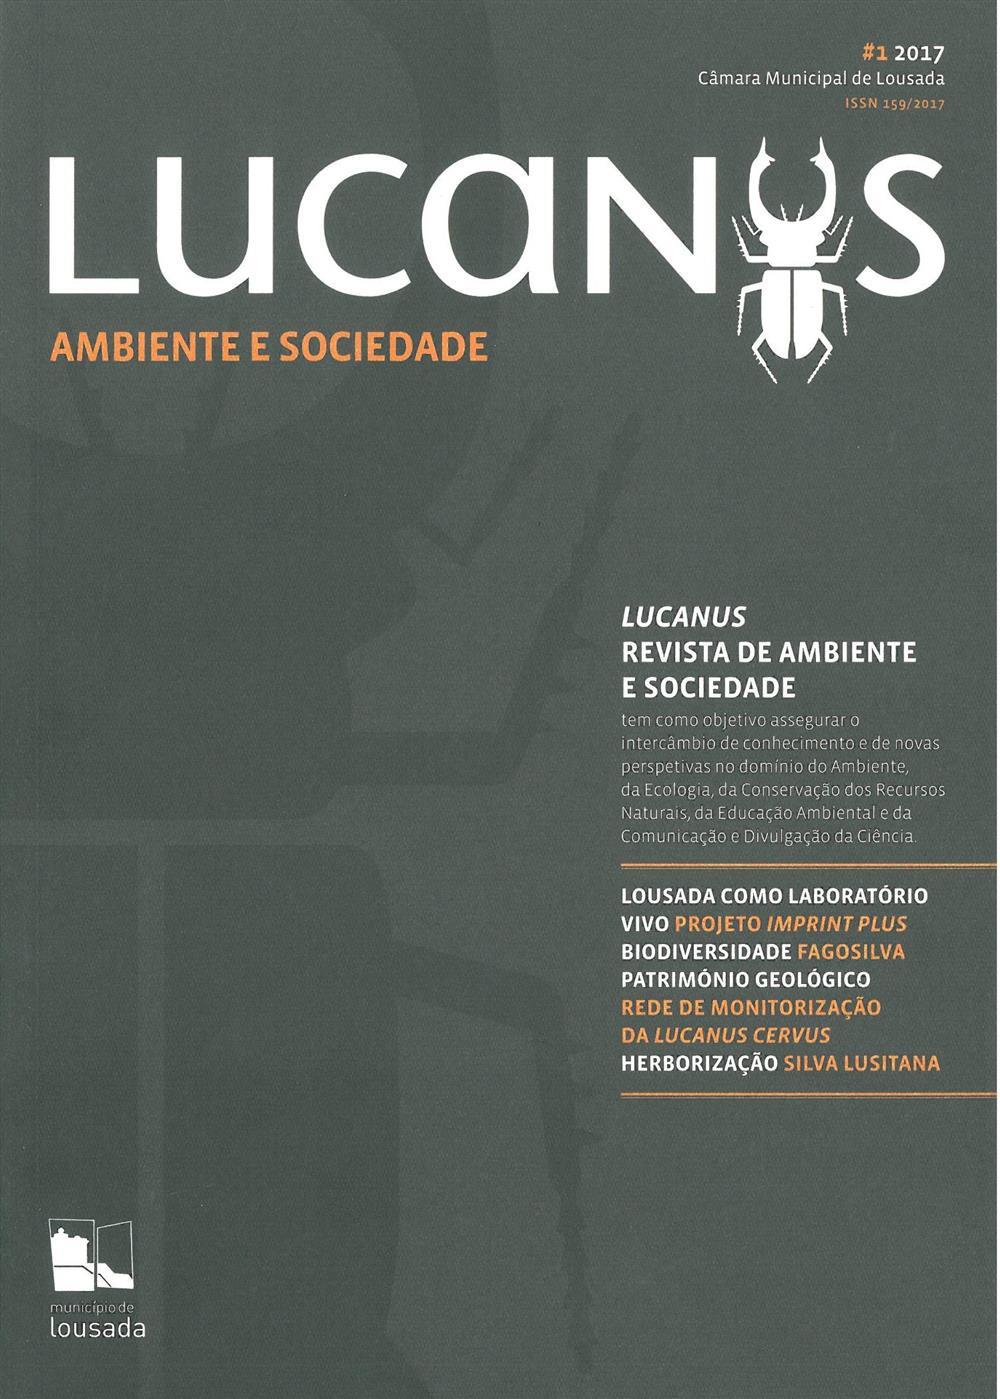 Lucanus_.jpg